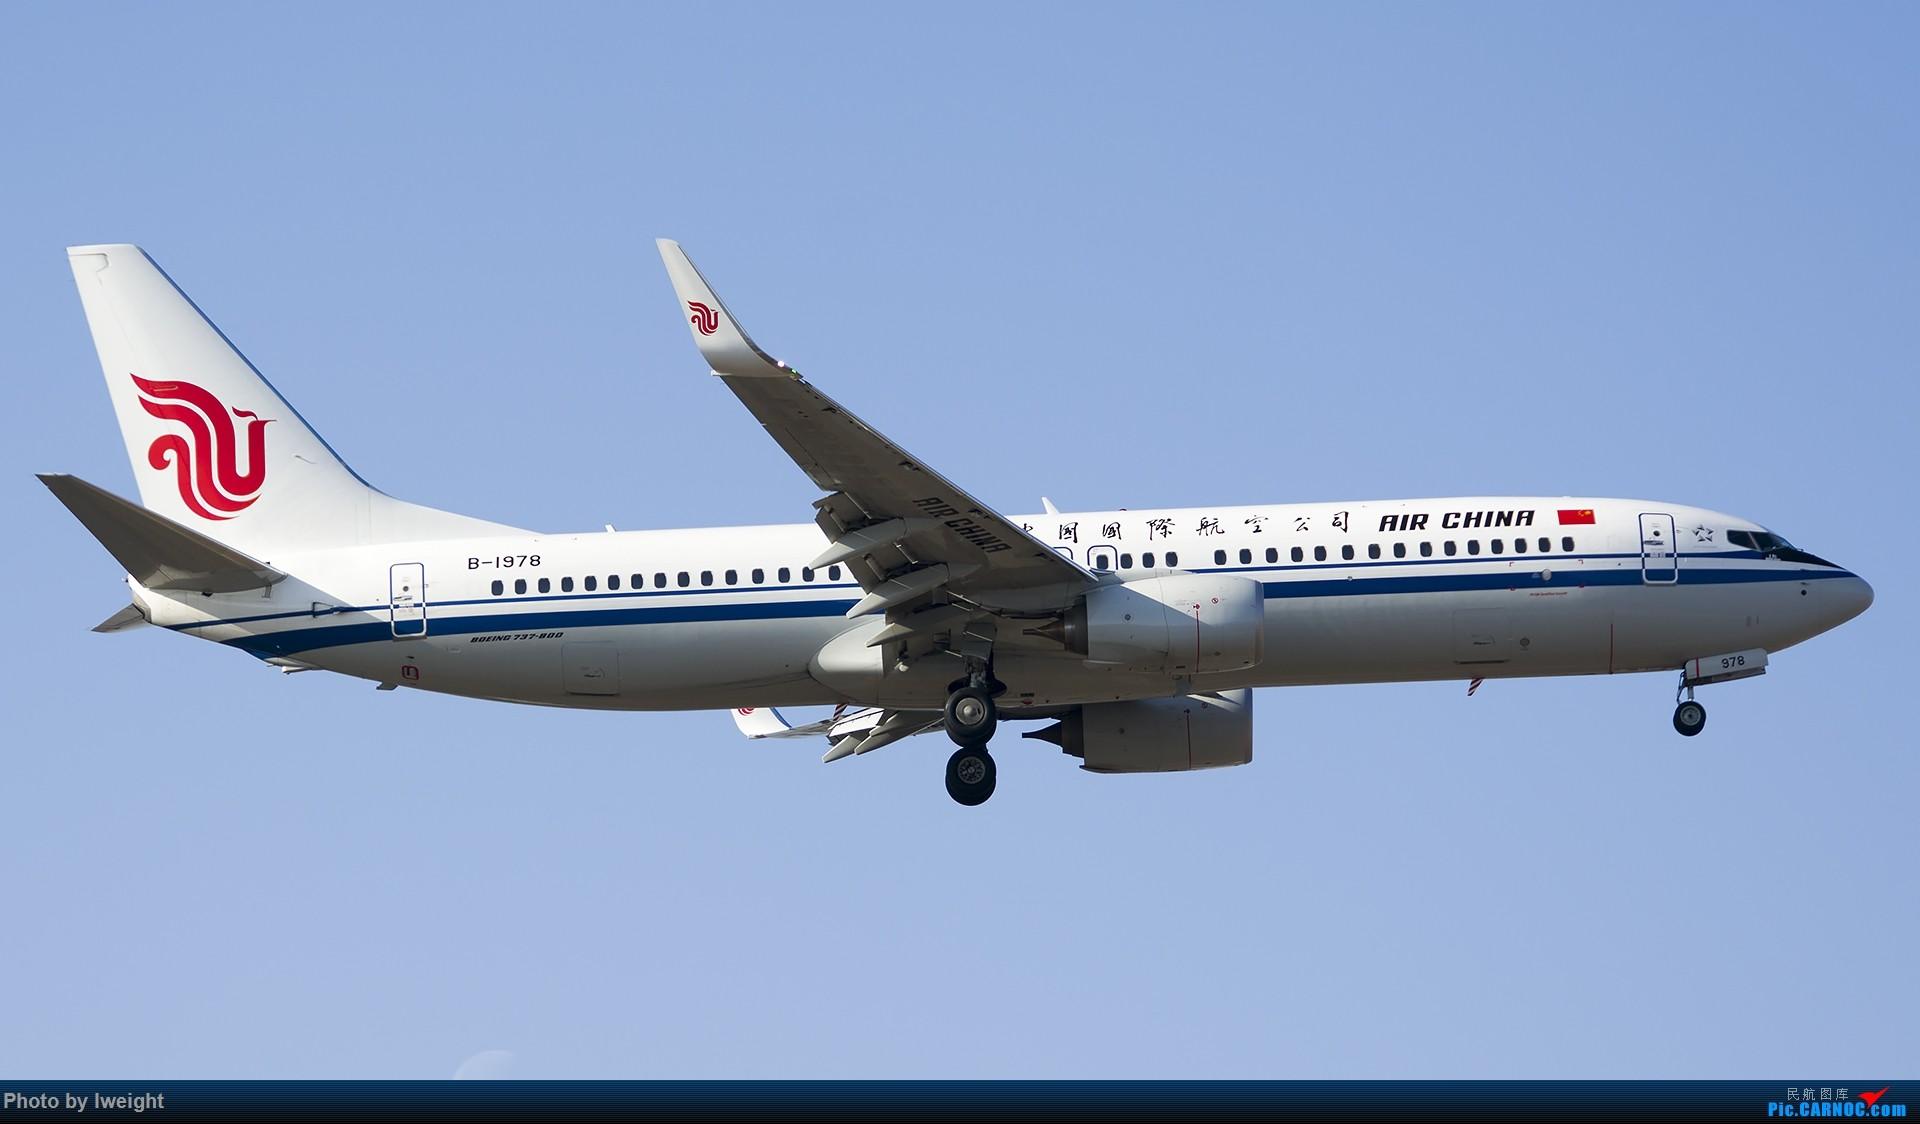 Re:[原创]庆祝升级777,发上今天在首都机场拍的所有飞机【2014-12-14】 BOEING 737-800 B-1978 中国北京首都国际机场